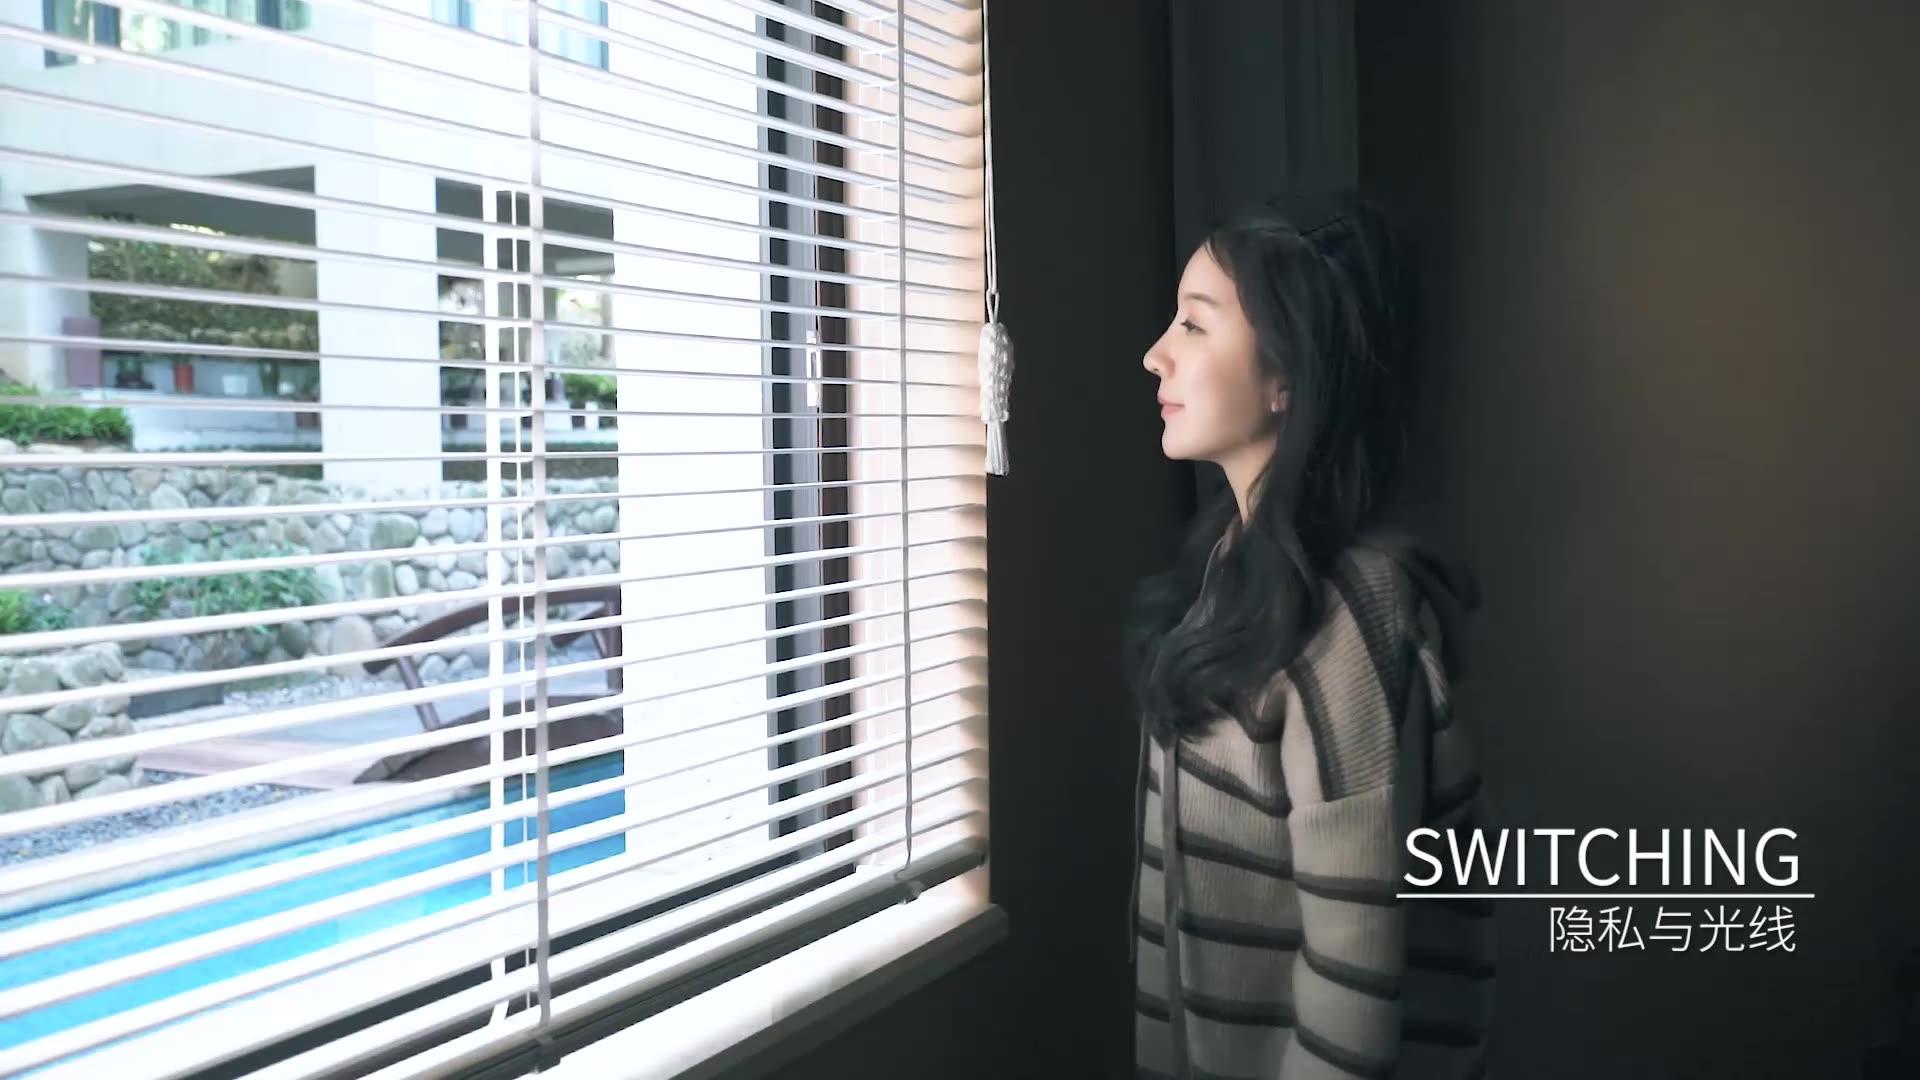 Hande Windows חיצוני תריסי מטע Persianas רכיבי תריסים Pvc חלקי תריסים